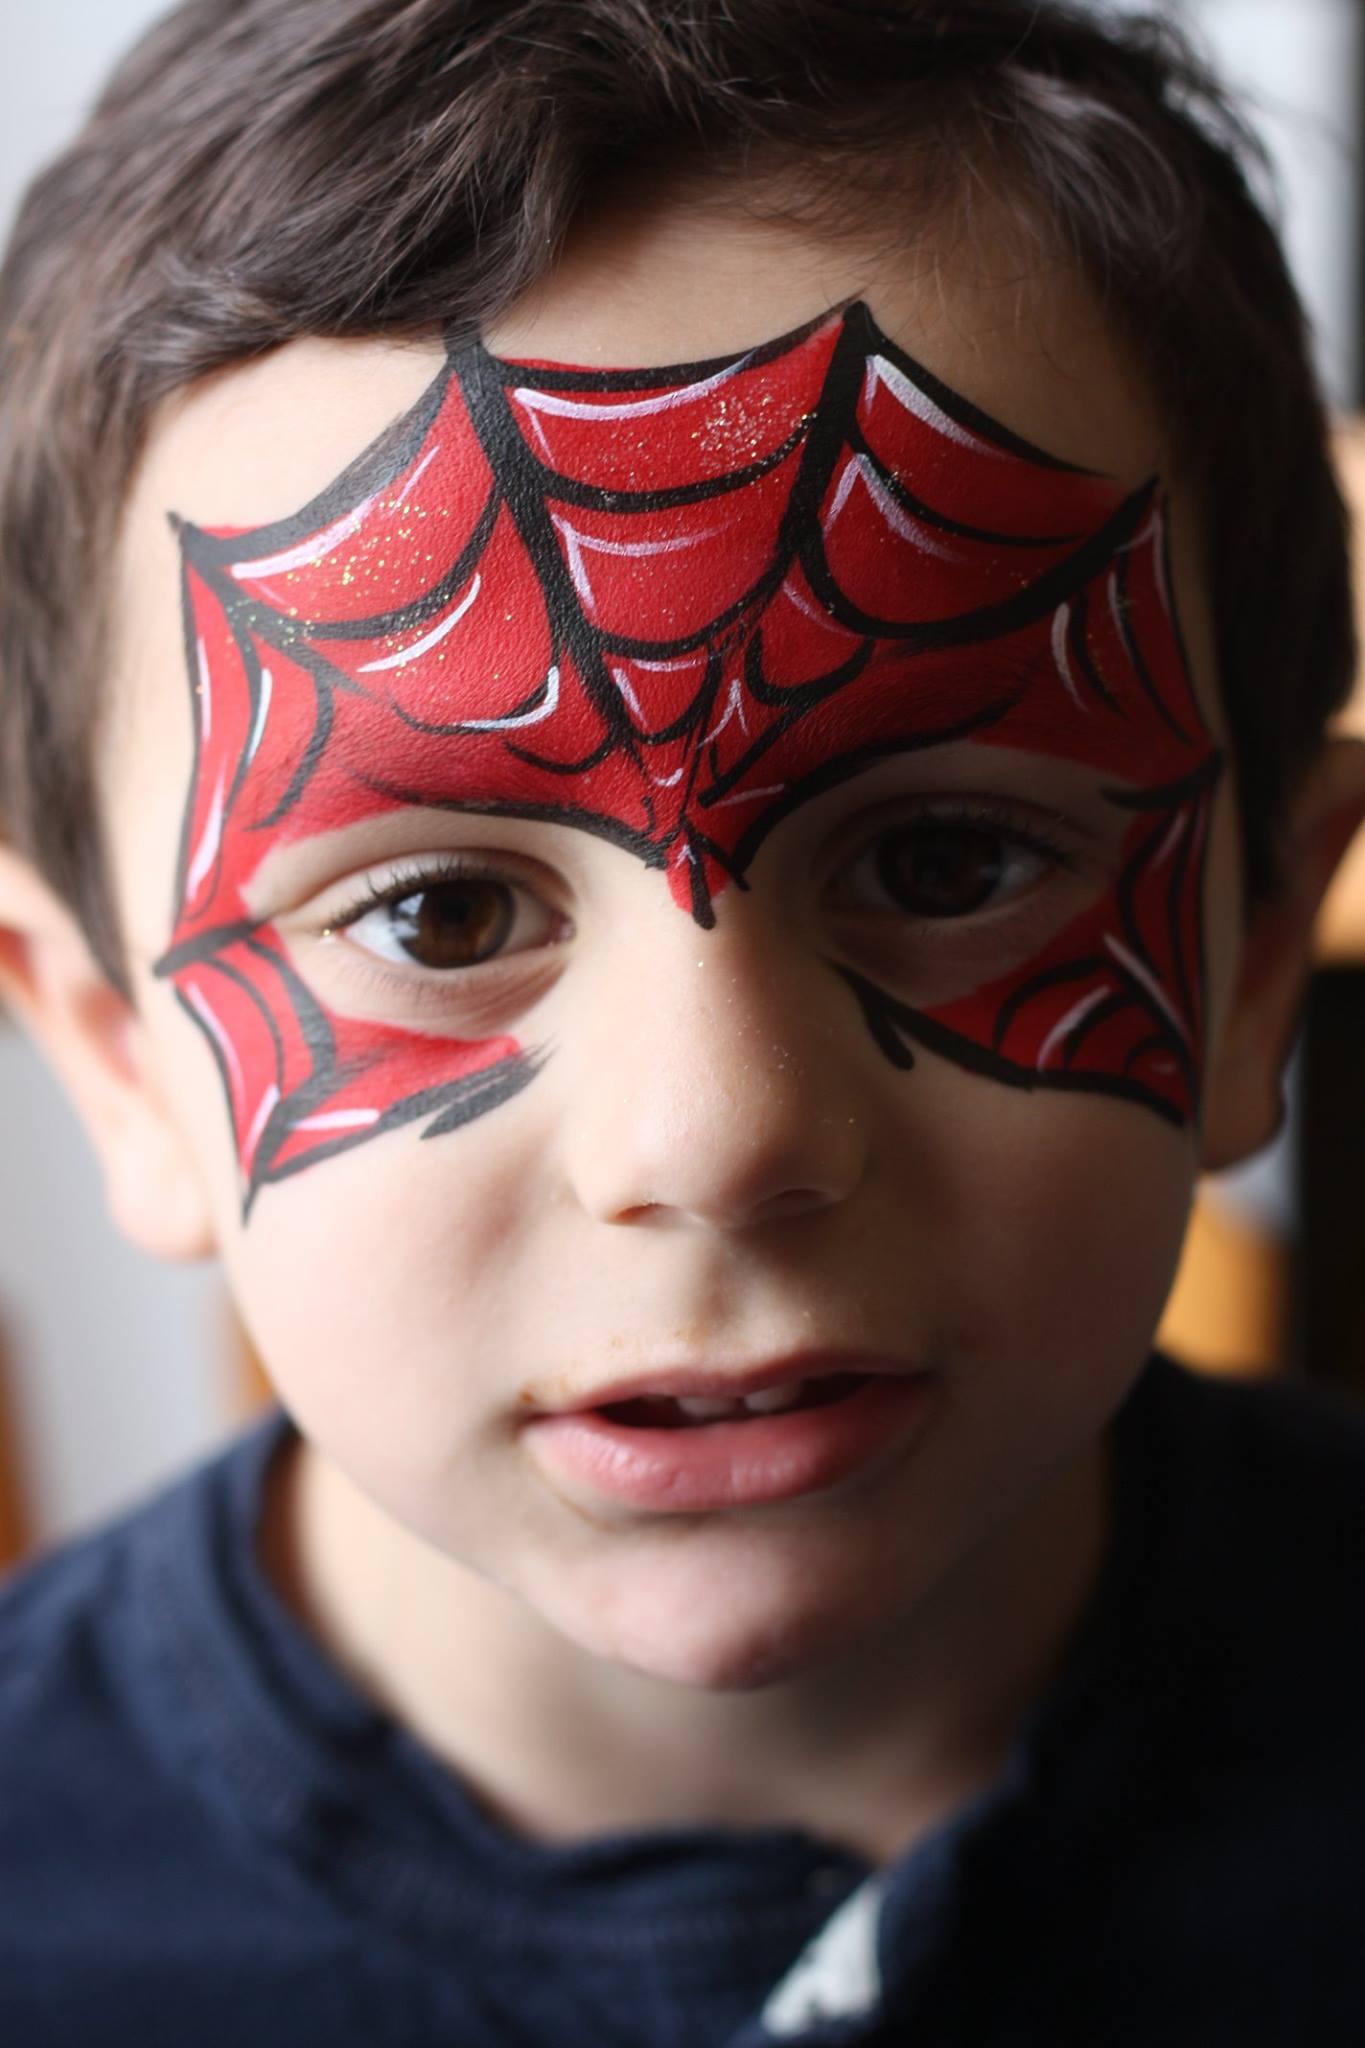 Spiderman makeup